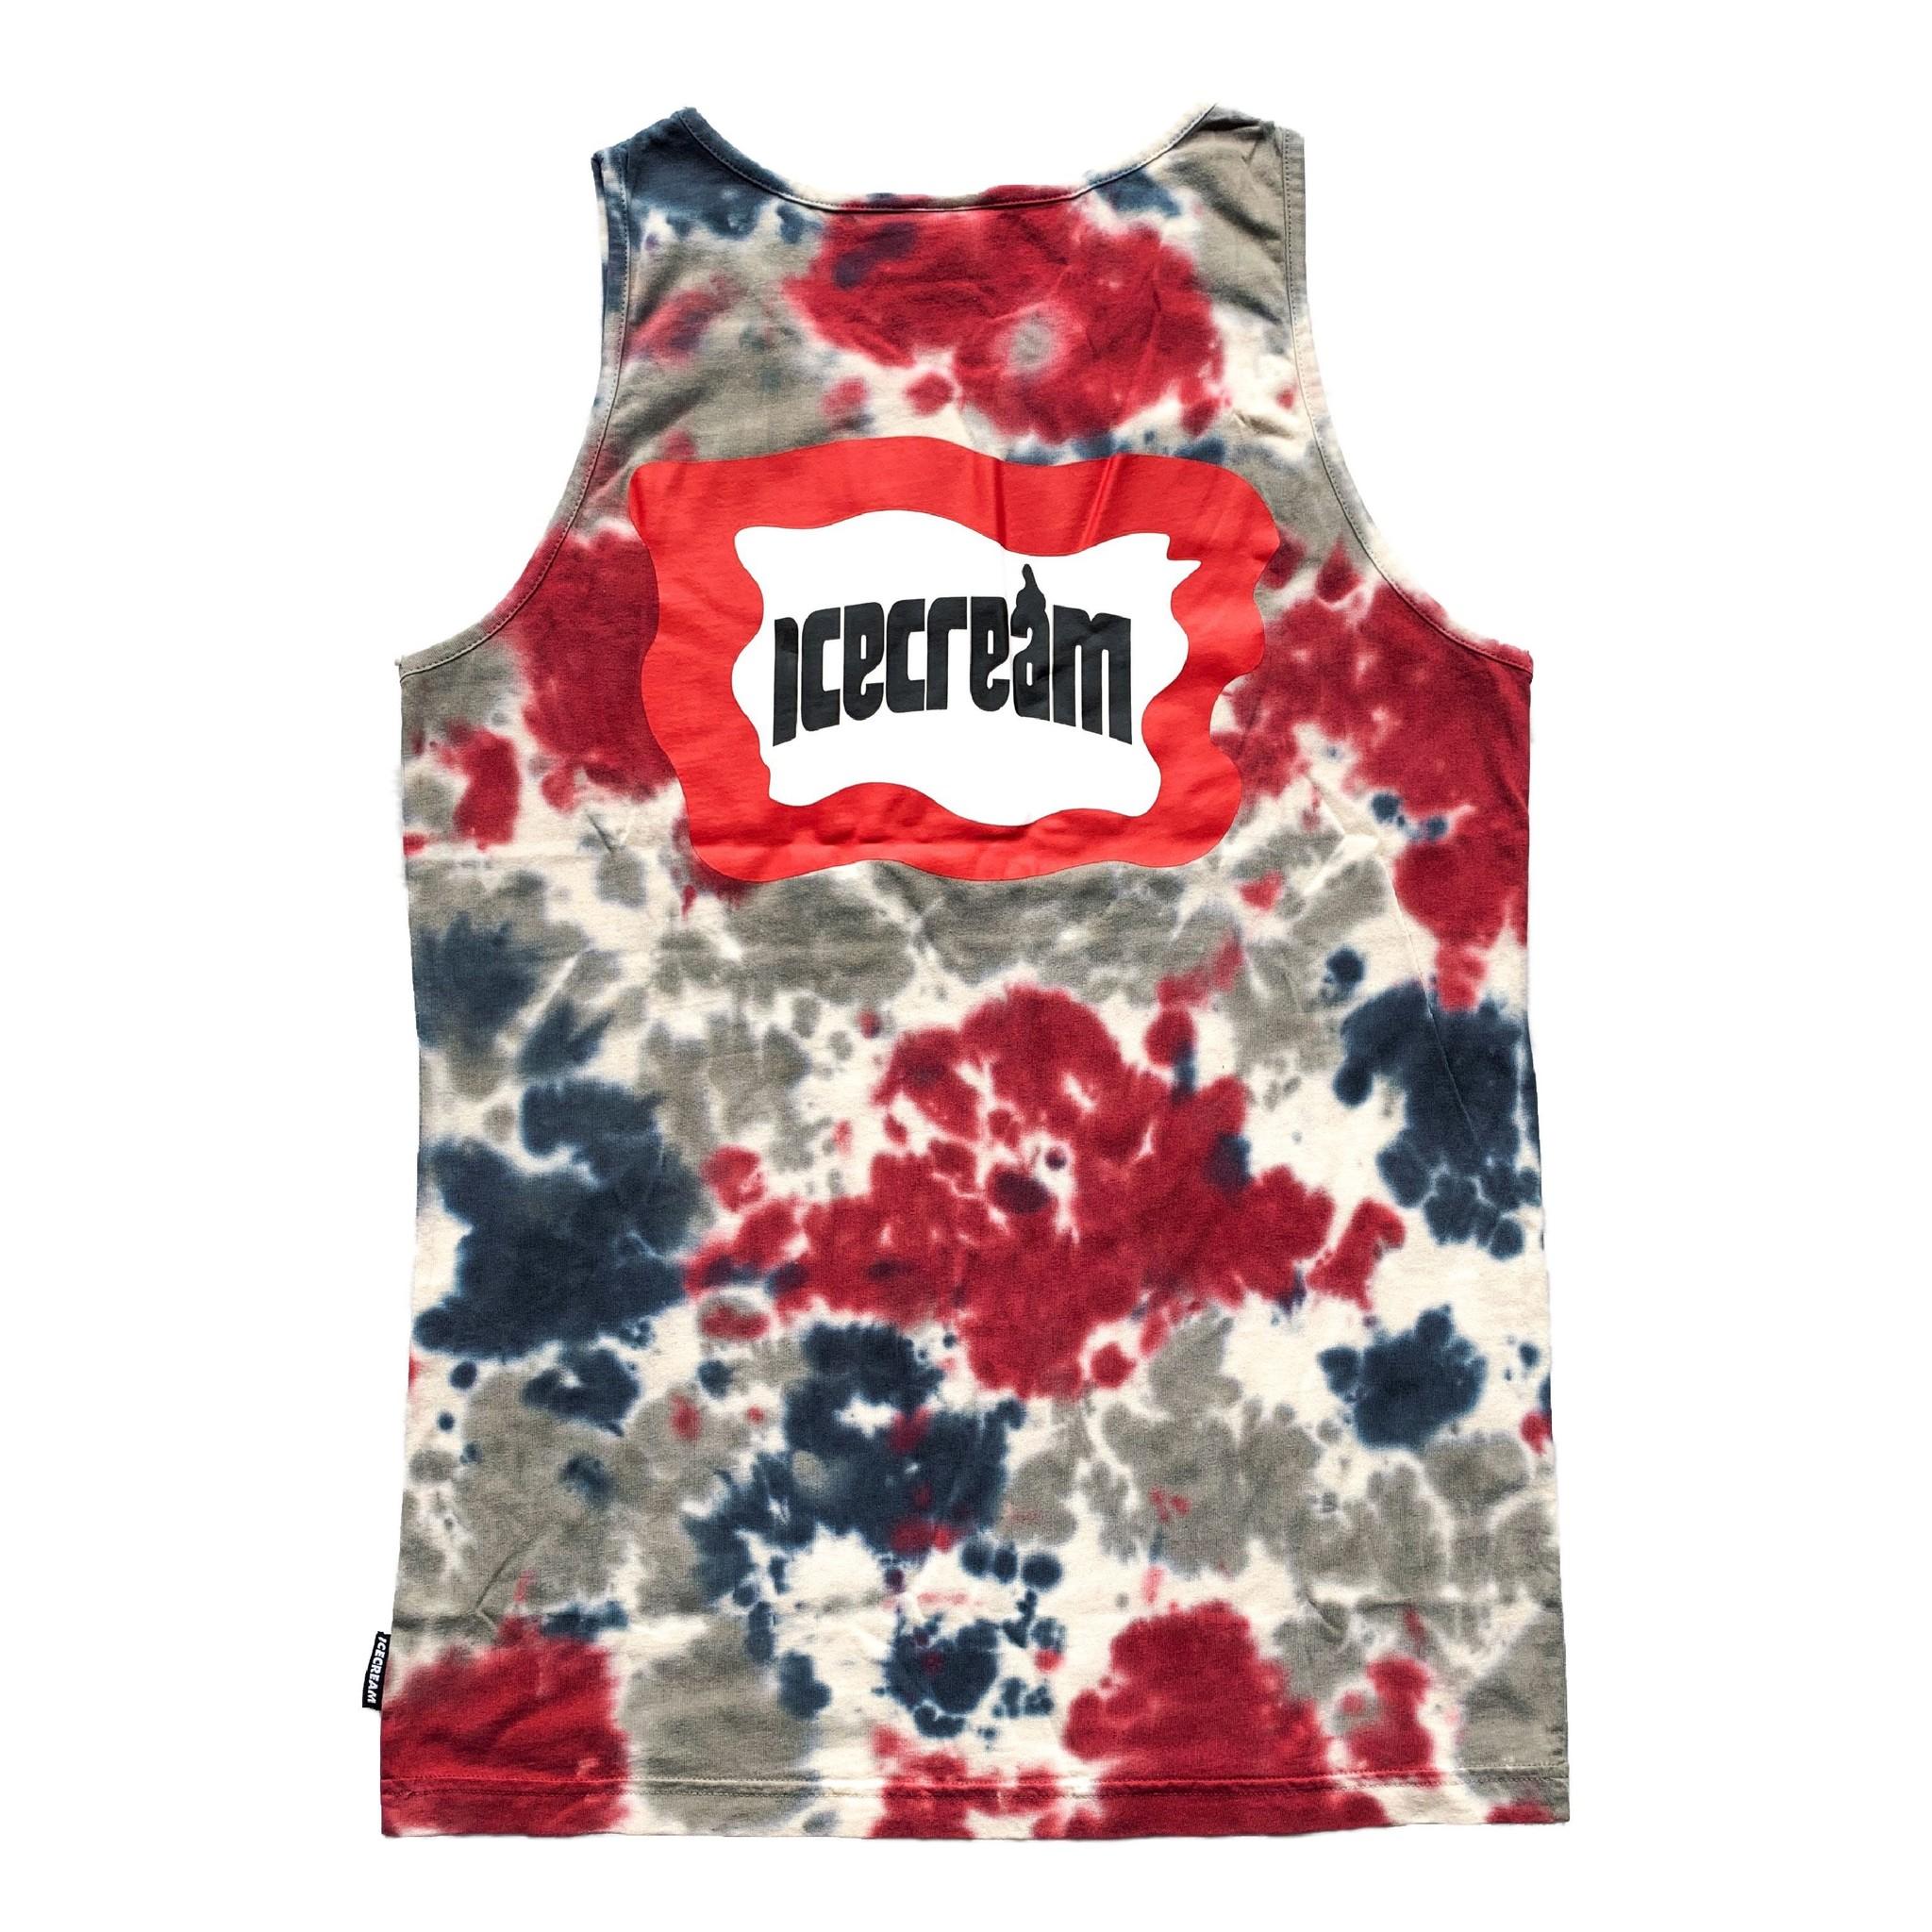 Icecream Icecream Stacker Tank Tie dye